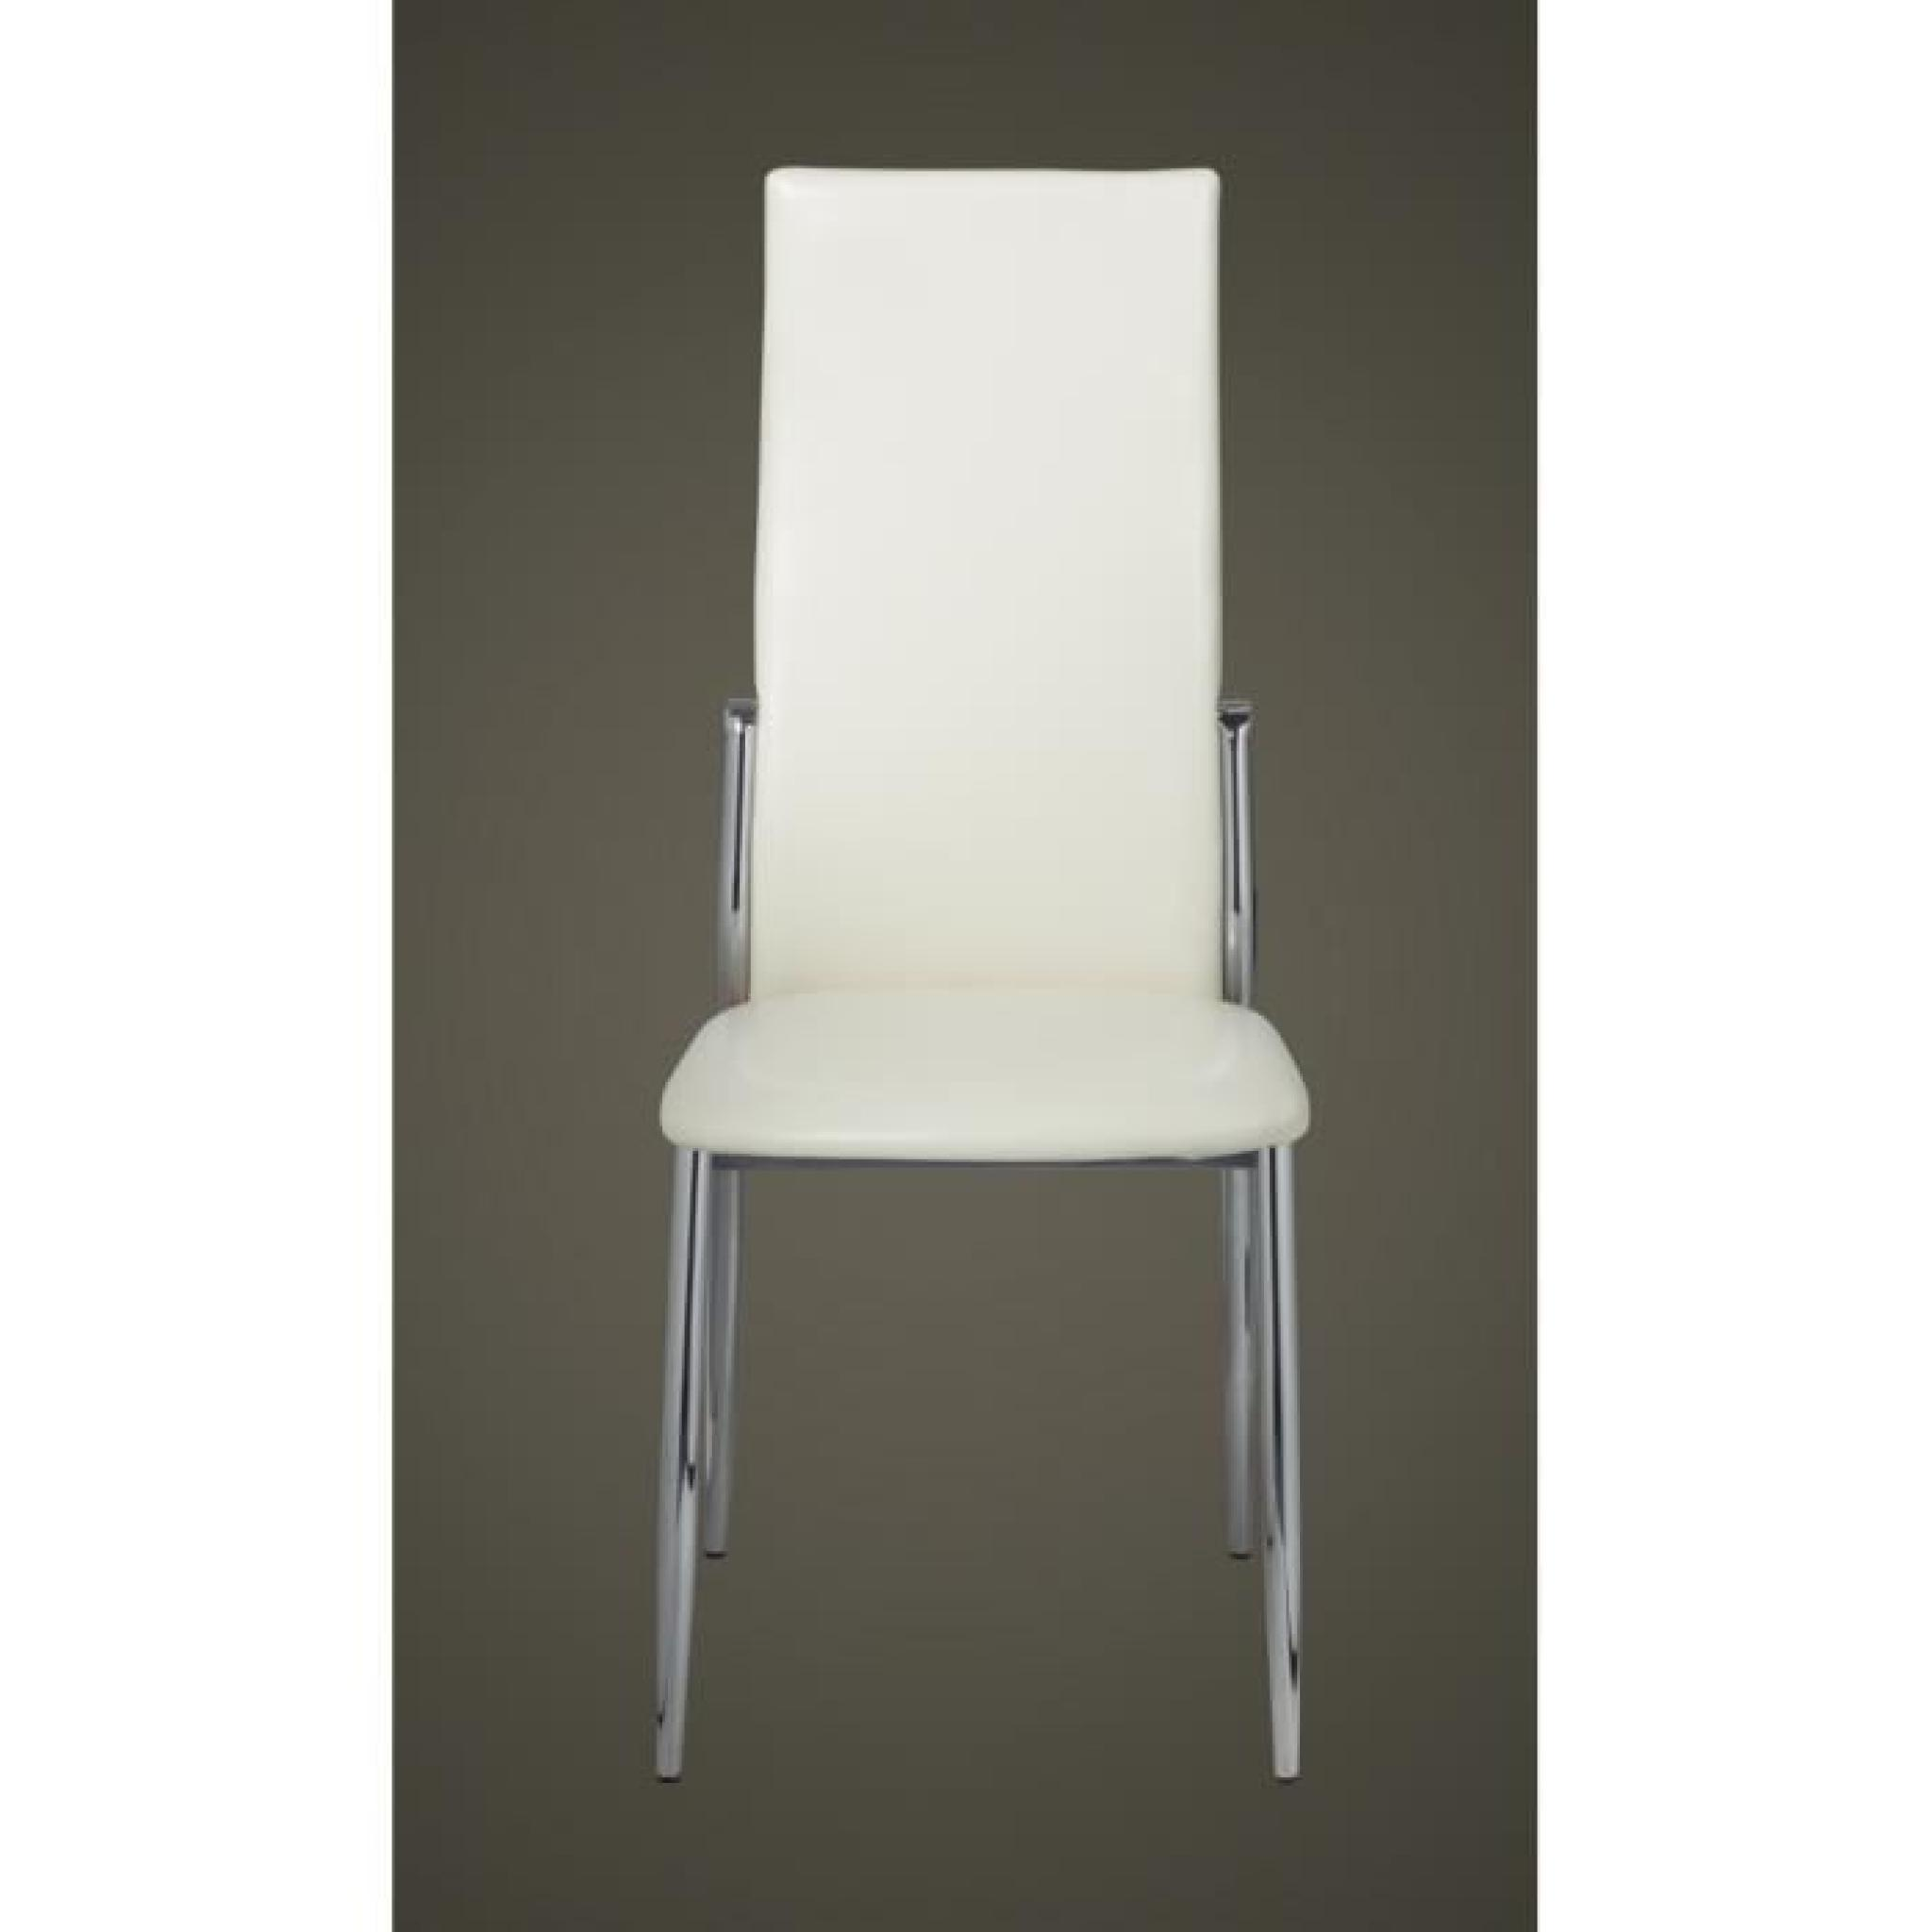 2 chaises de salle à manger alu   achat/vente chaise salle a ...